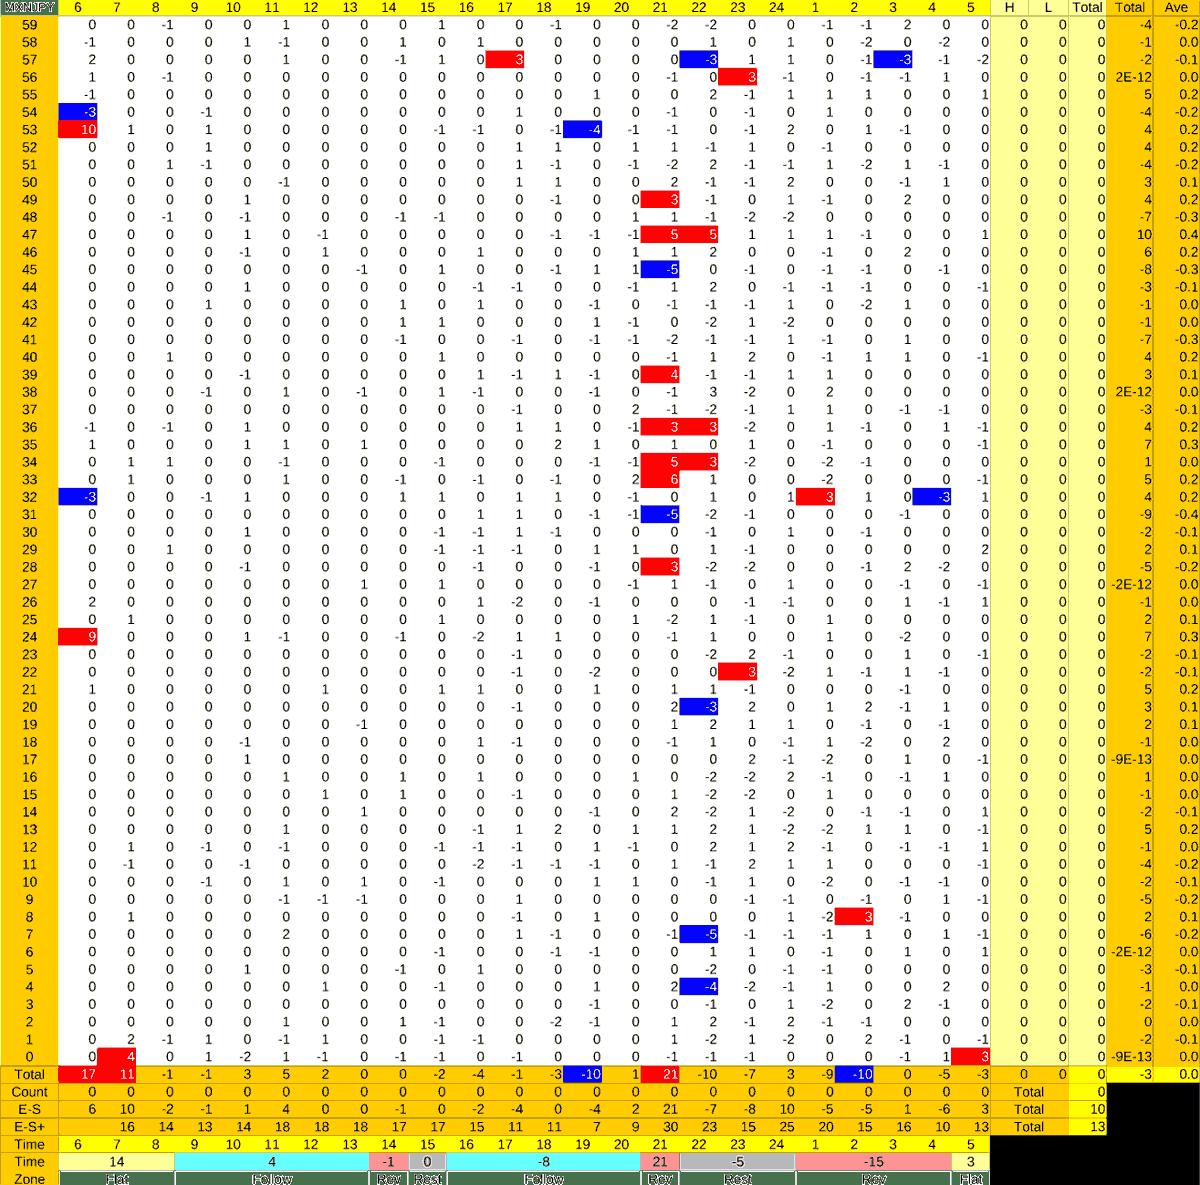 20210610_HS(3)MXNJPY